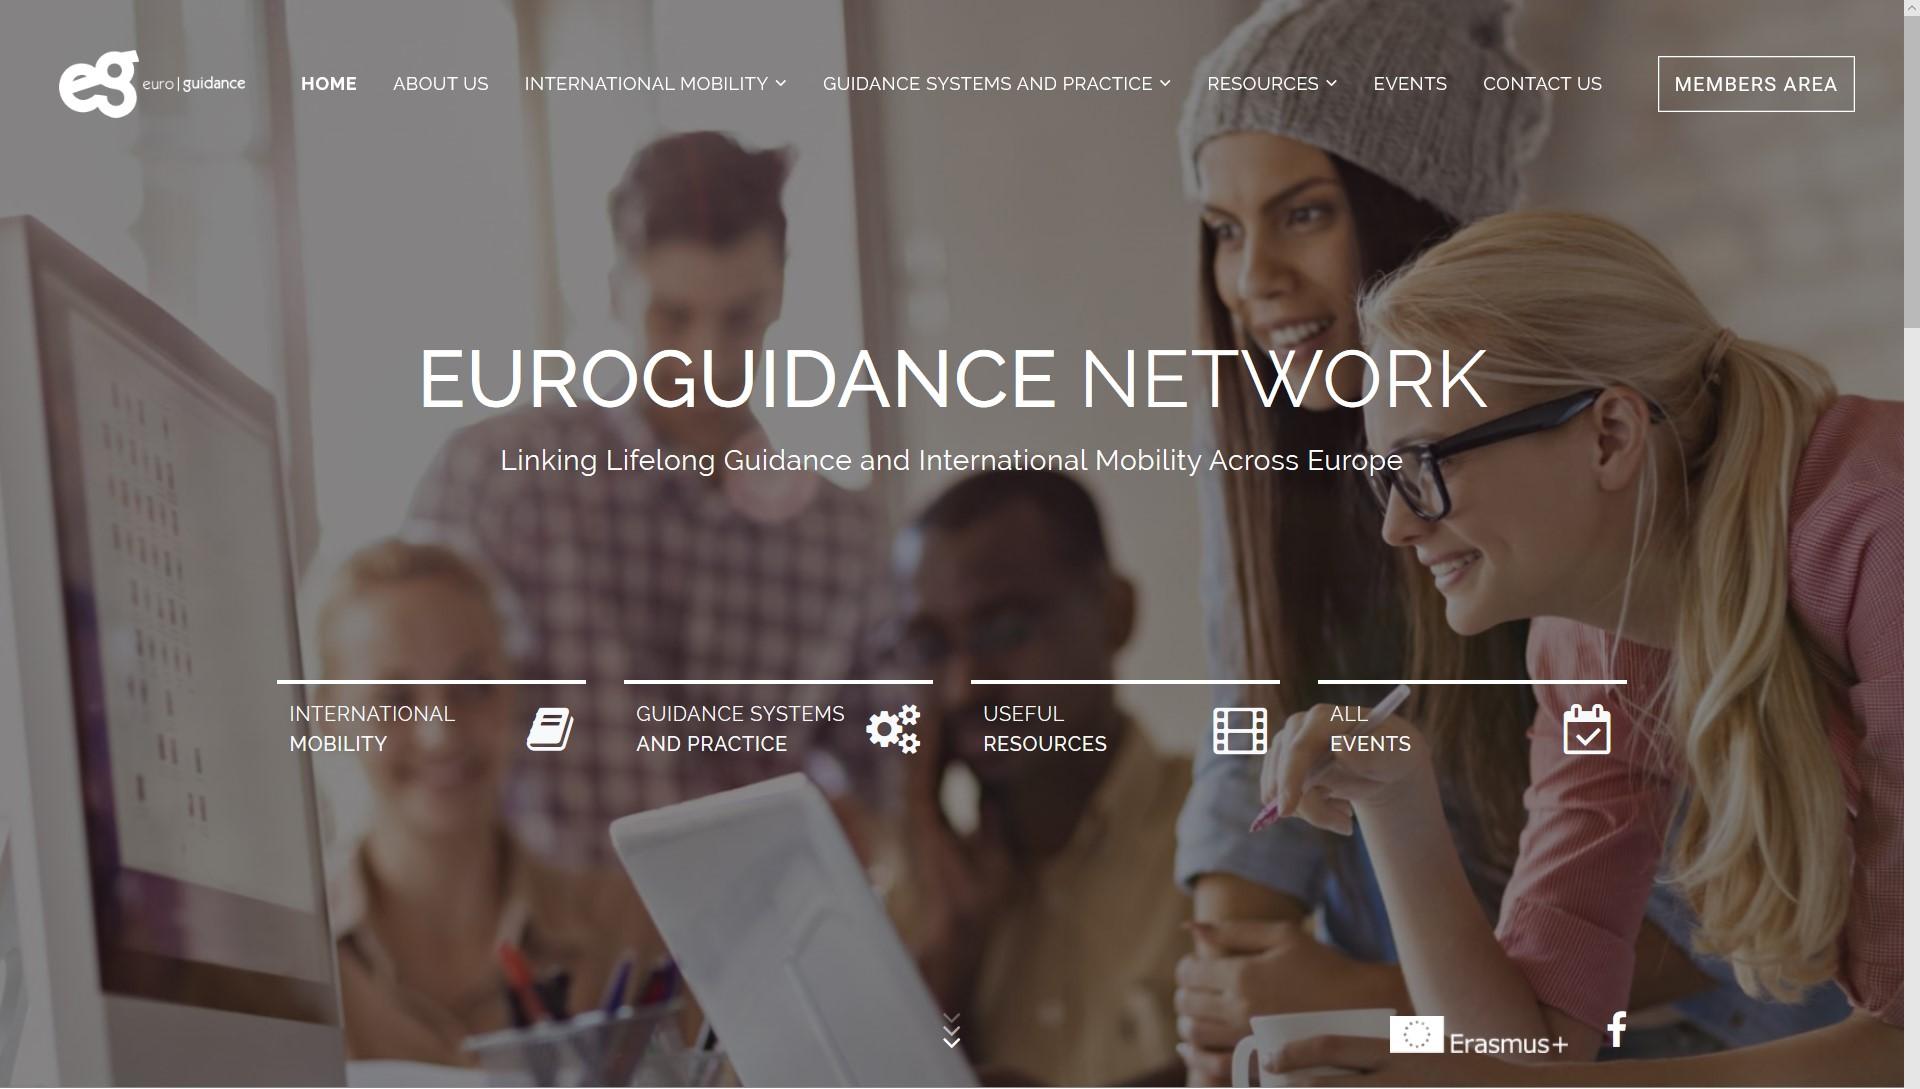 screenshot euroguidance